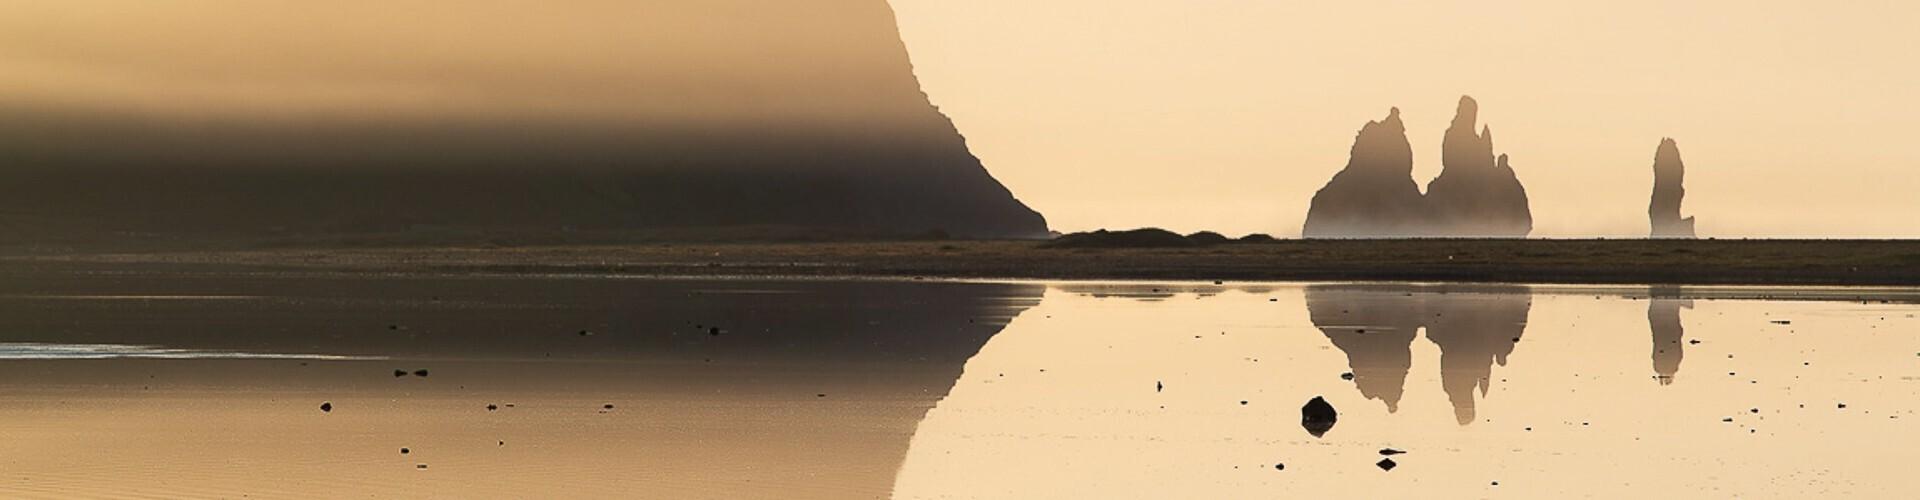 voyage photo islande sud greg gerault header